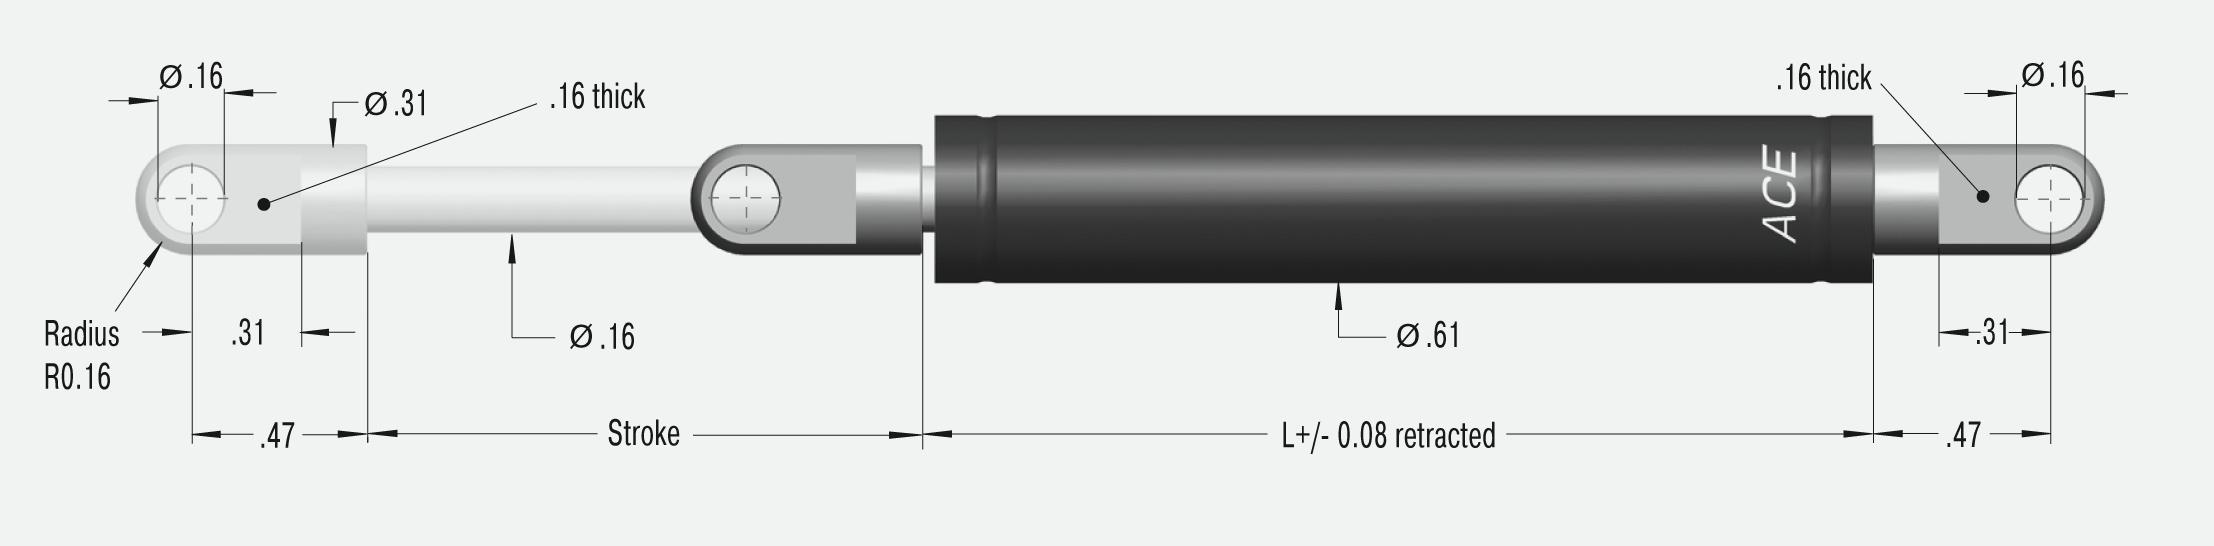 GZ-15-50